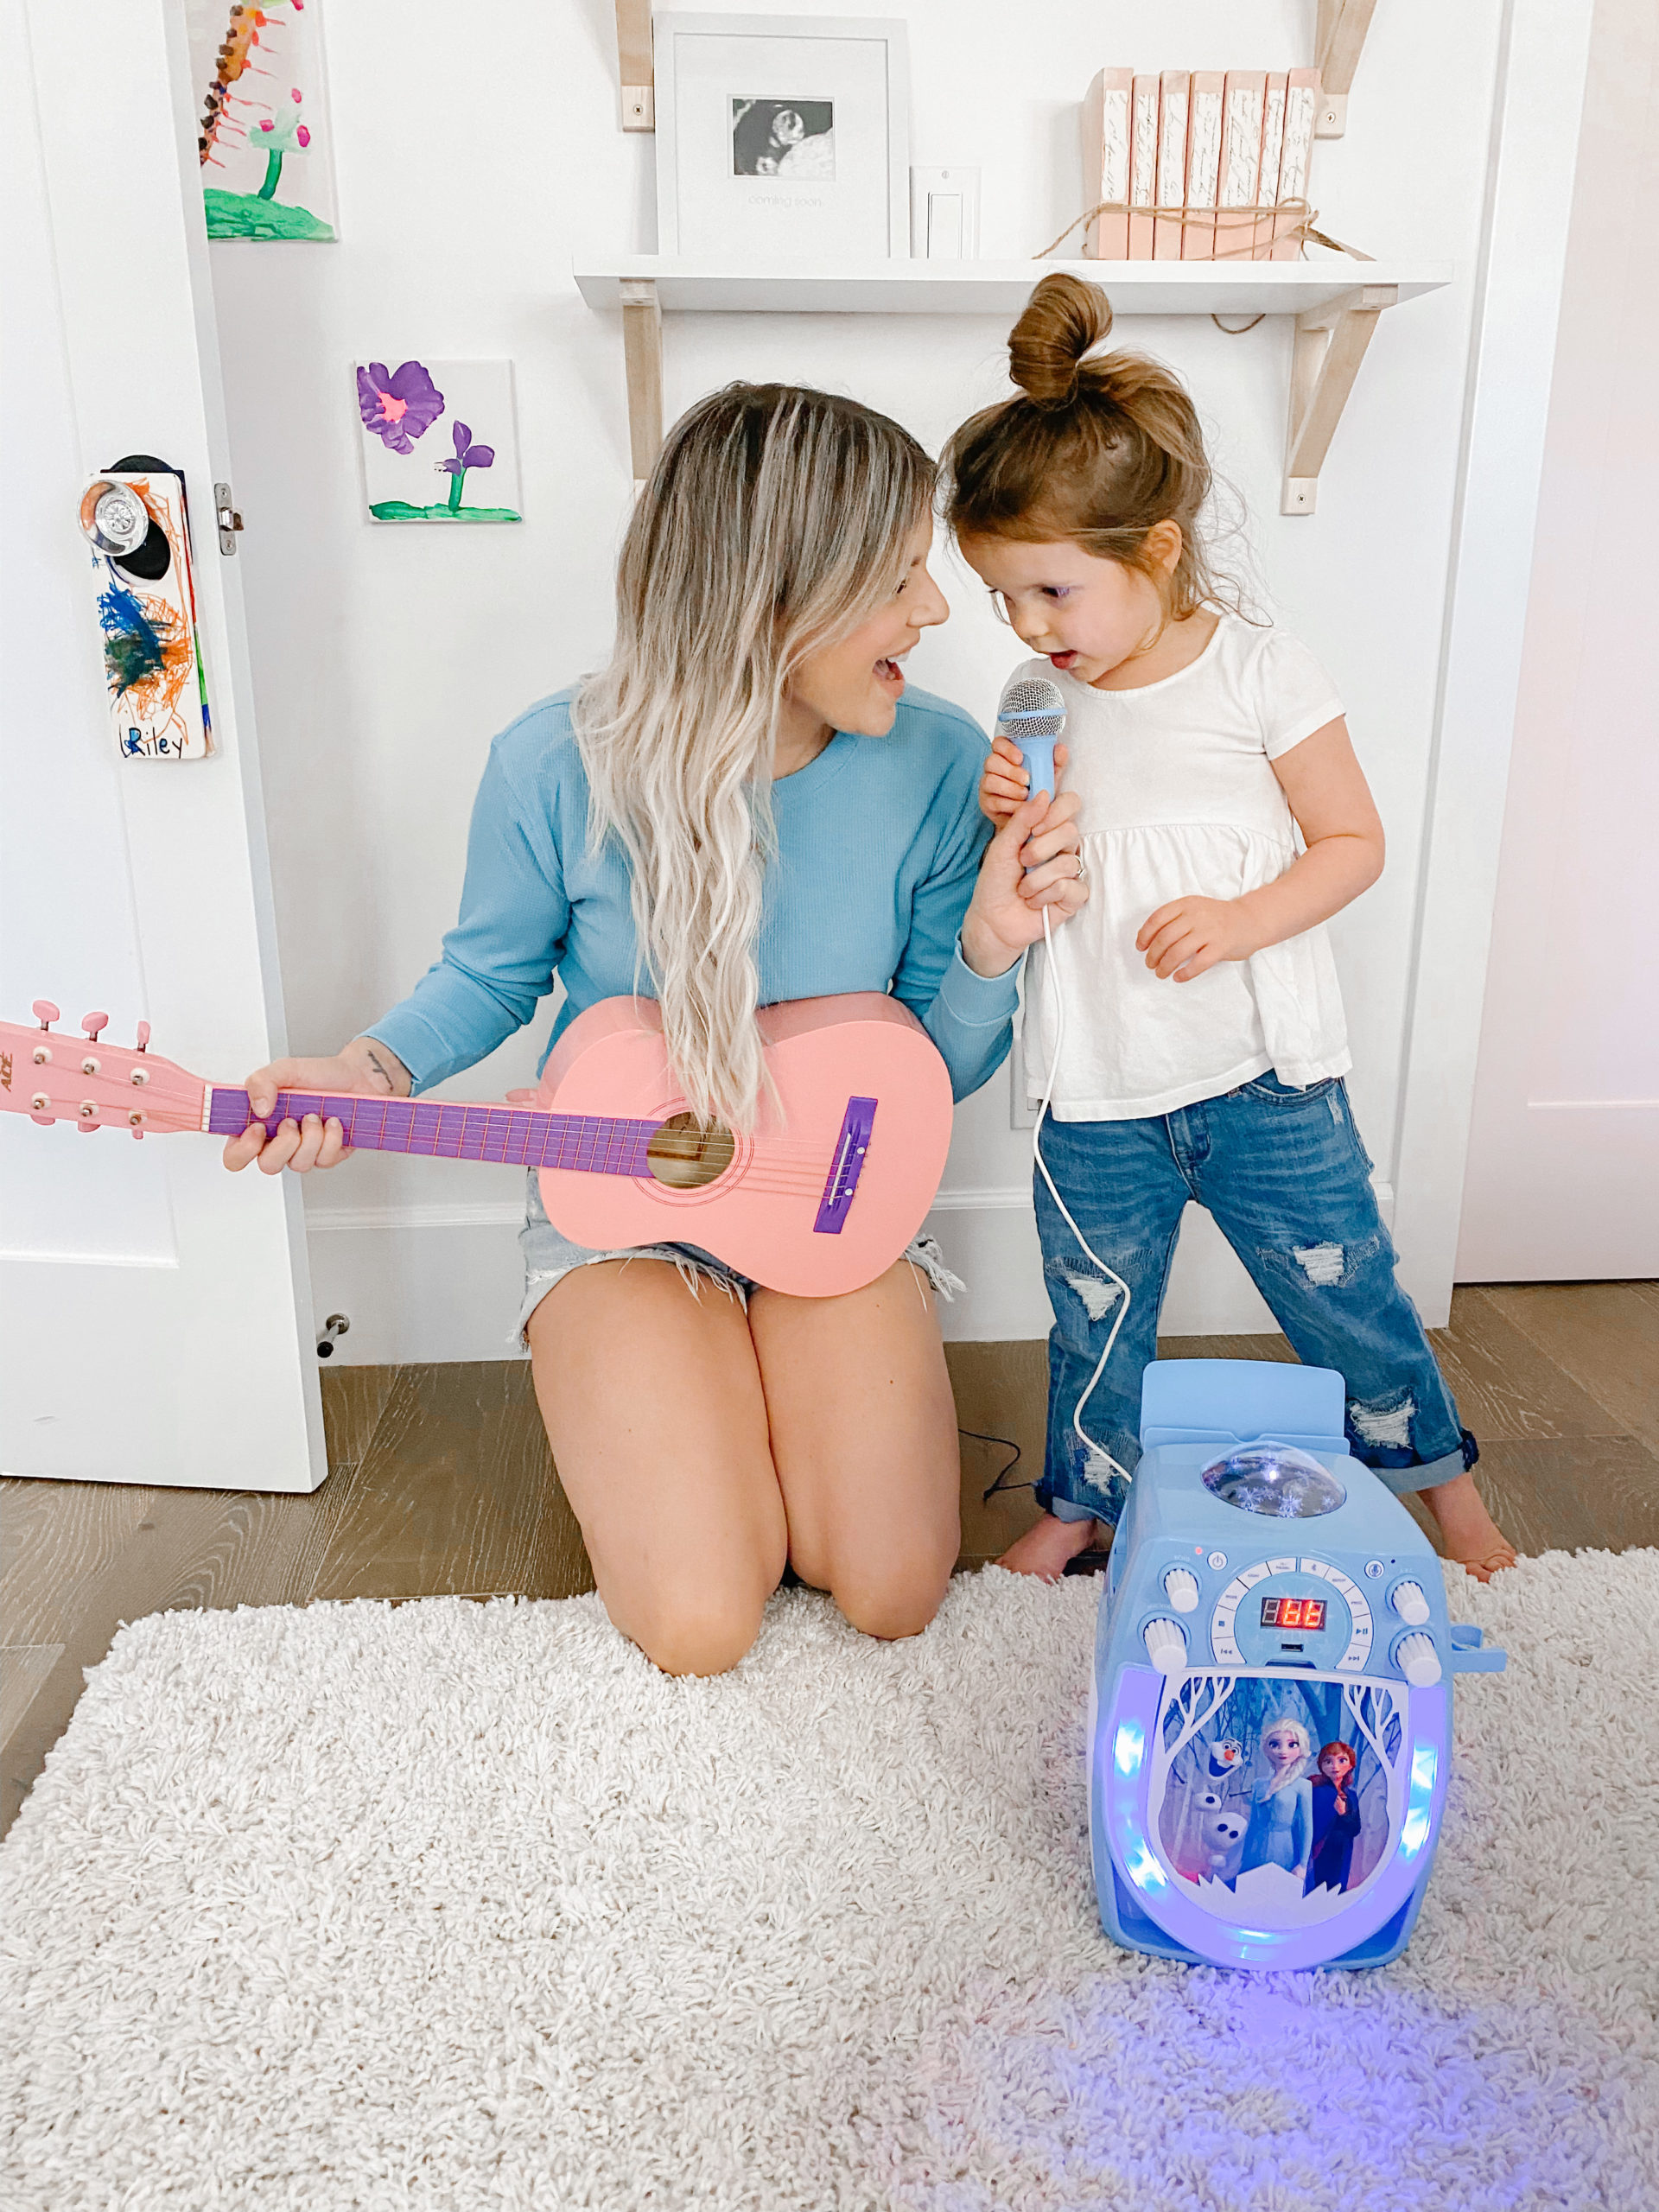 fun toys - guitar and karaoke